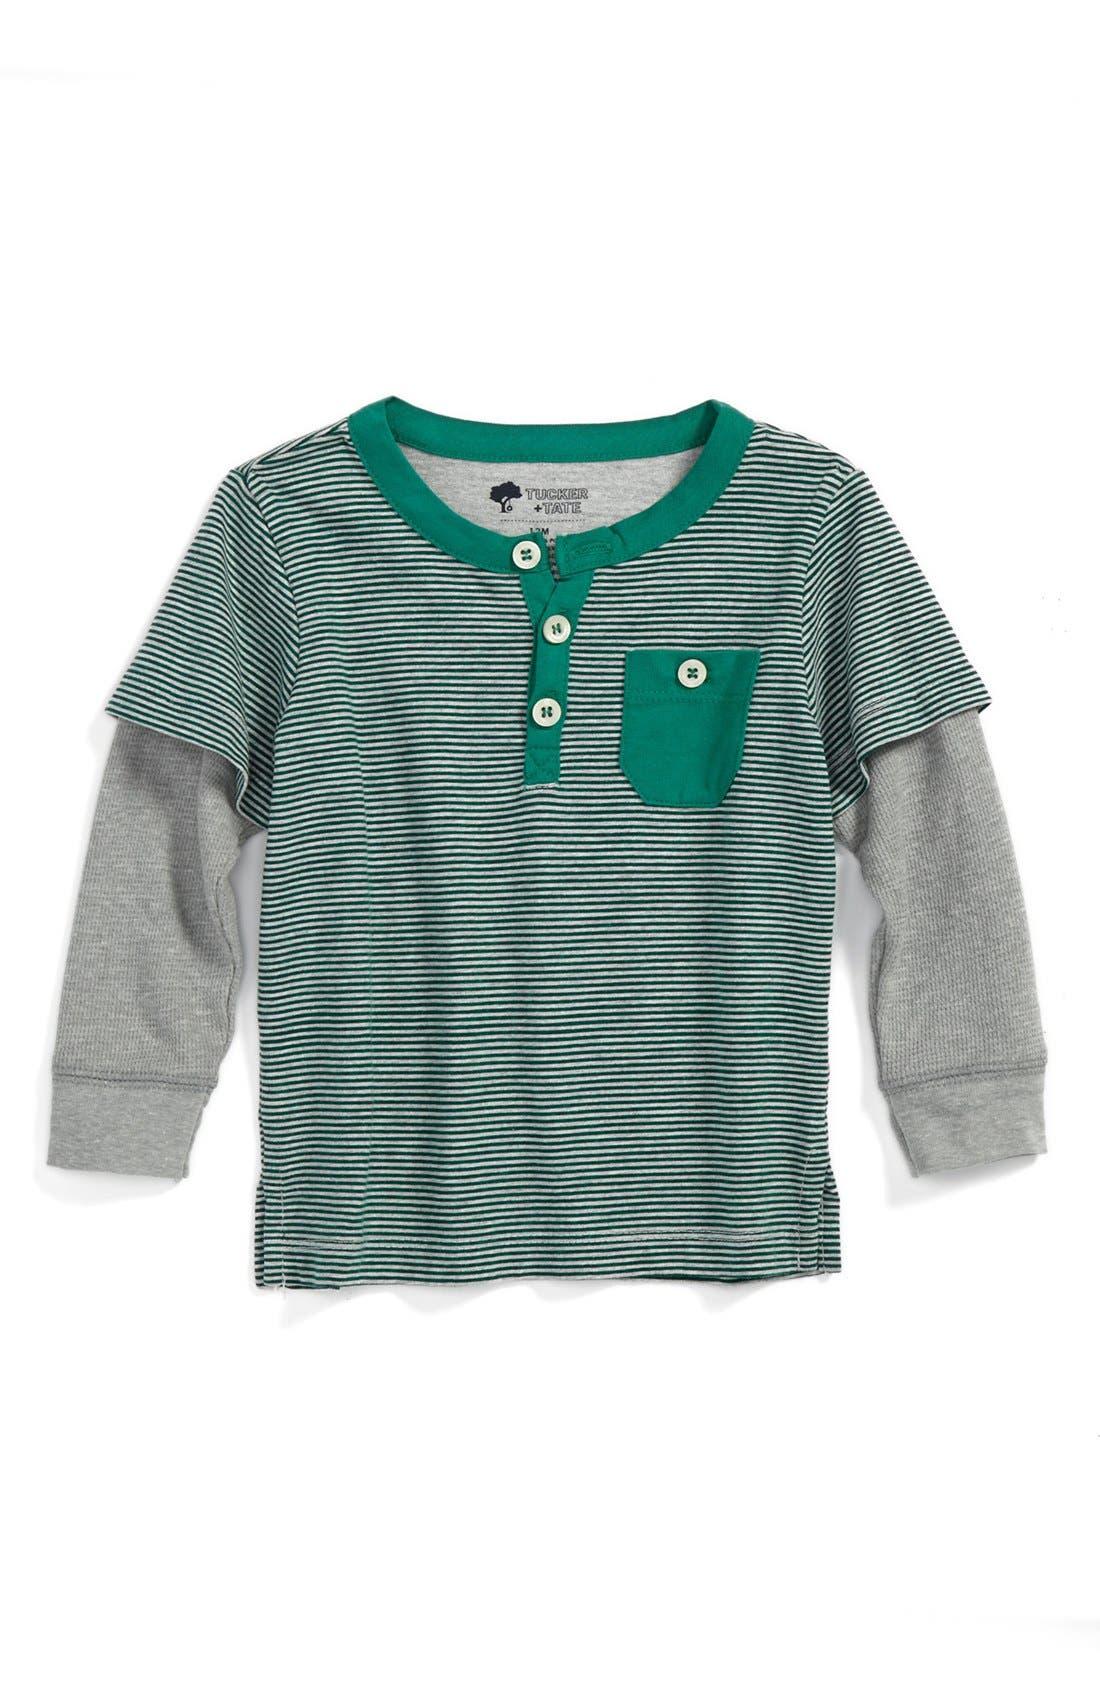 Main Image - Tucker + Tate 'Parker Road'  Layered Sleeve Henley T-Shirt (Toddler Boys)